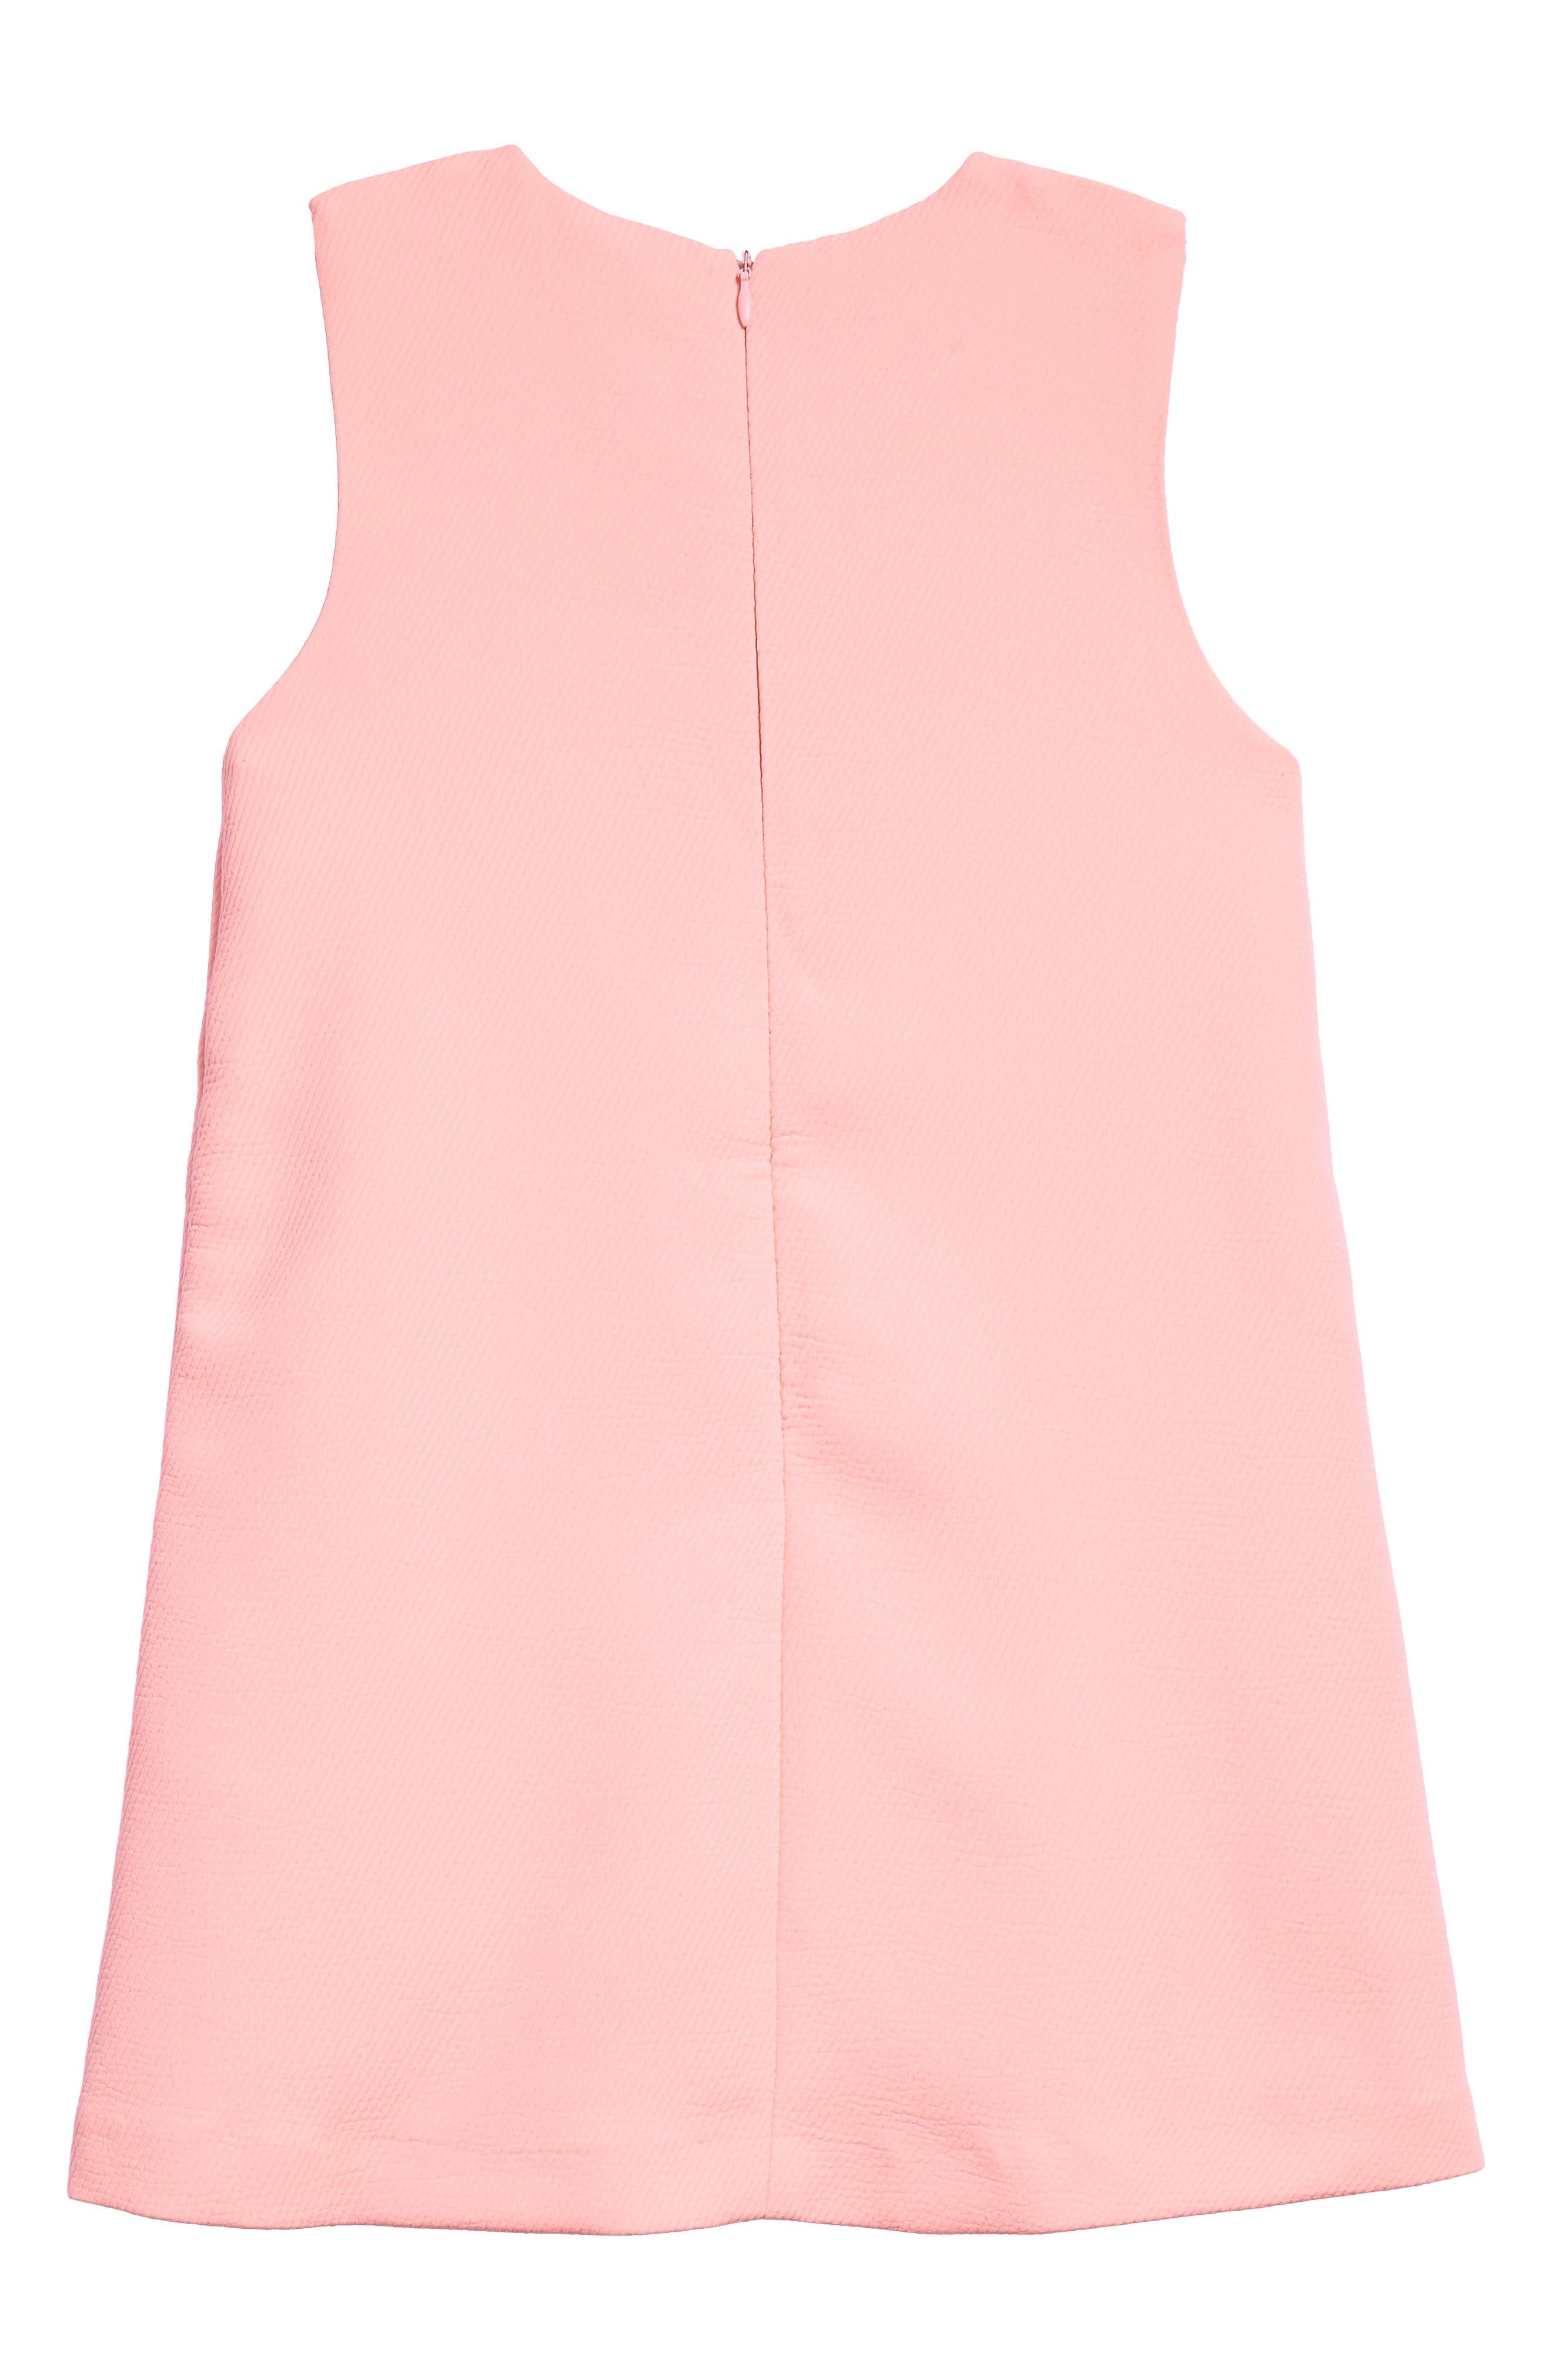 Mod Sleeveless Shift Dress,                             Alternate thumbnail 2, color,                             Pink